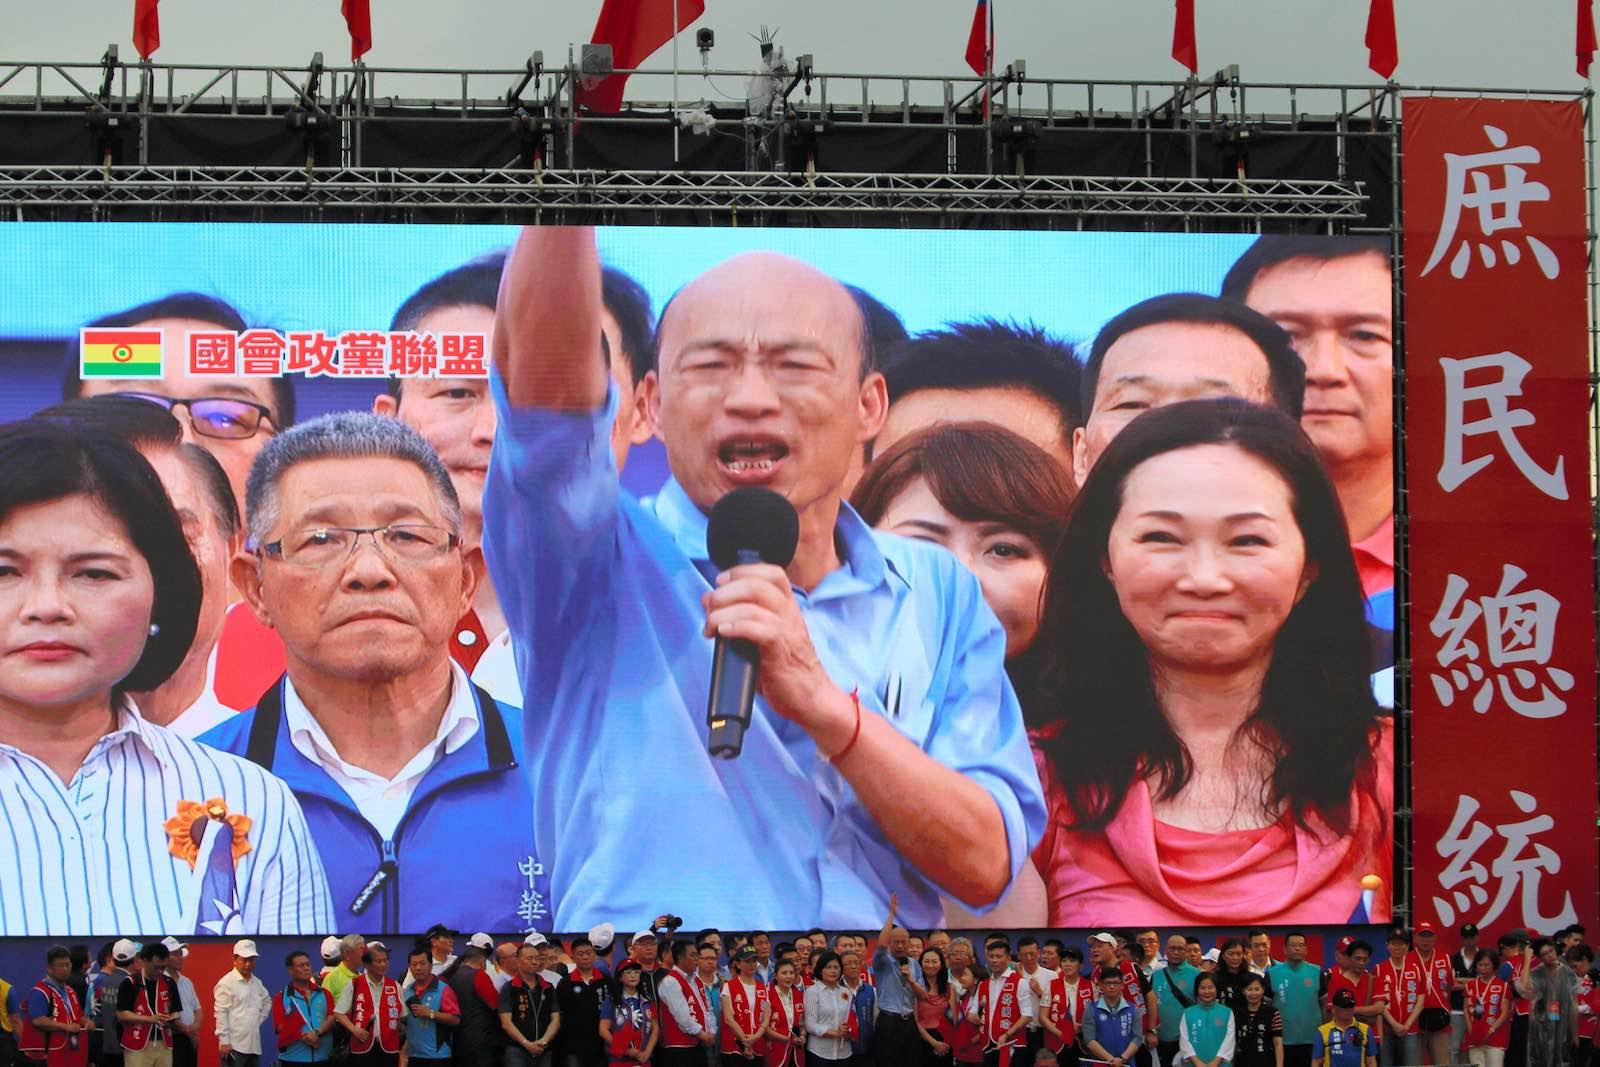 Kaohsiung Mayor Han Kuo-yu announces his run for Taiwan Presidential election (Photo: Asahi Shimbun via Getty)